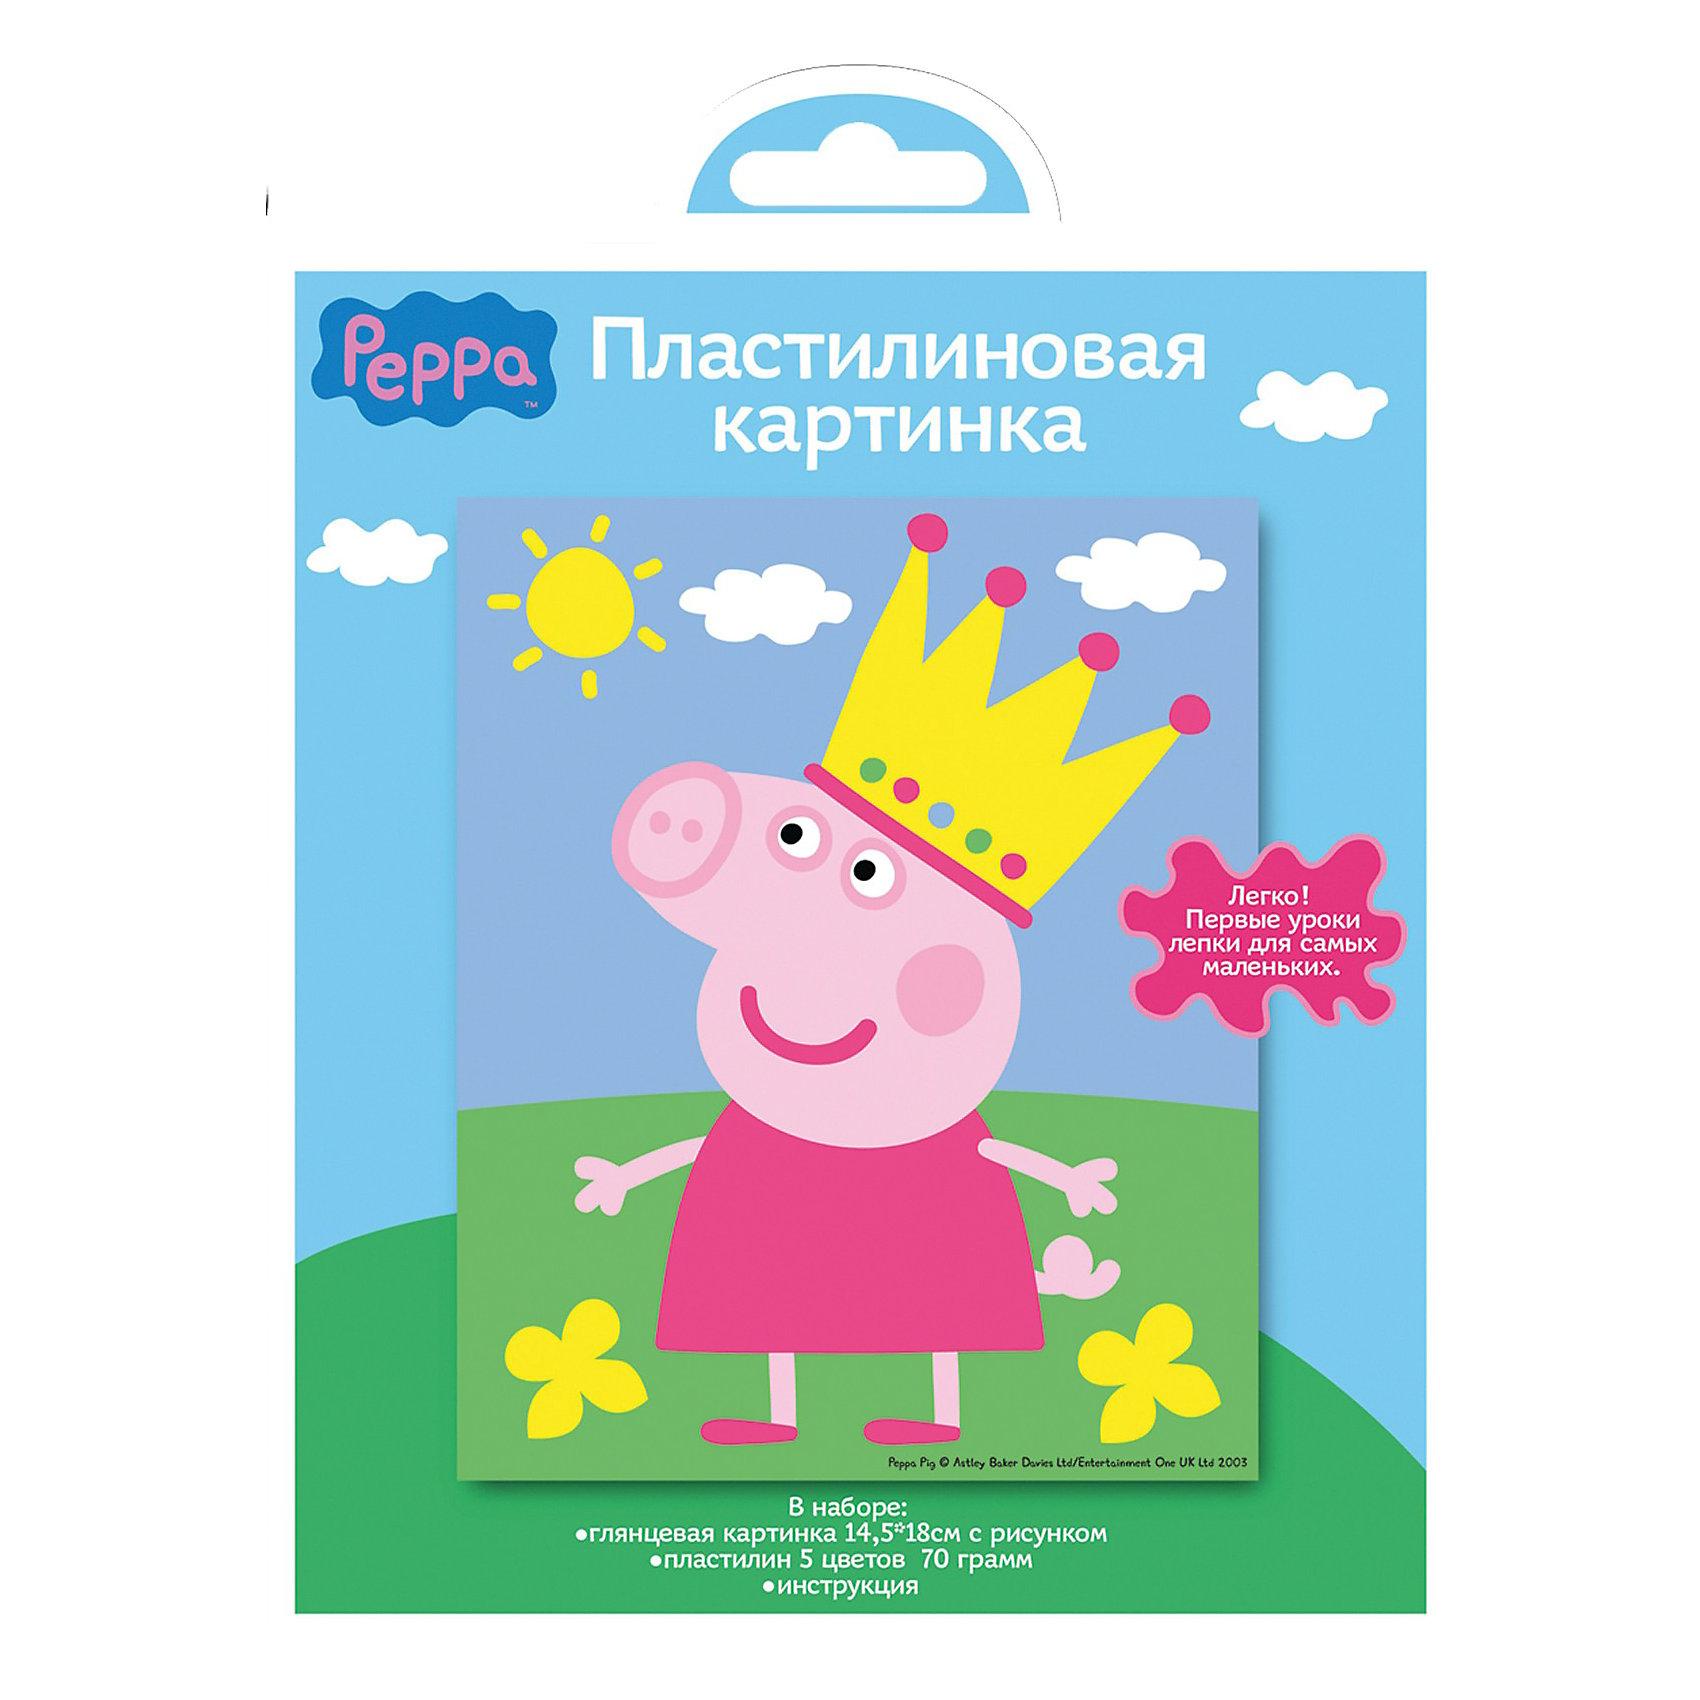 Пластилиновая картинка Свинка Пеппа 14,5*18см